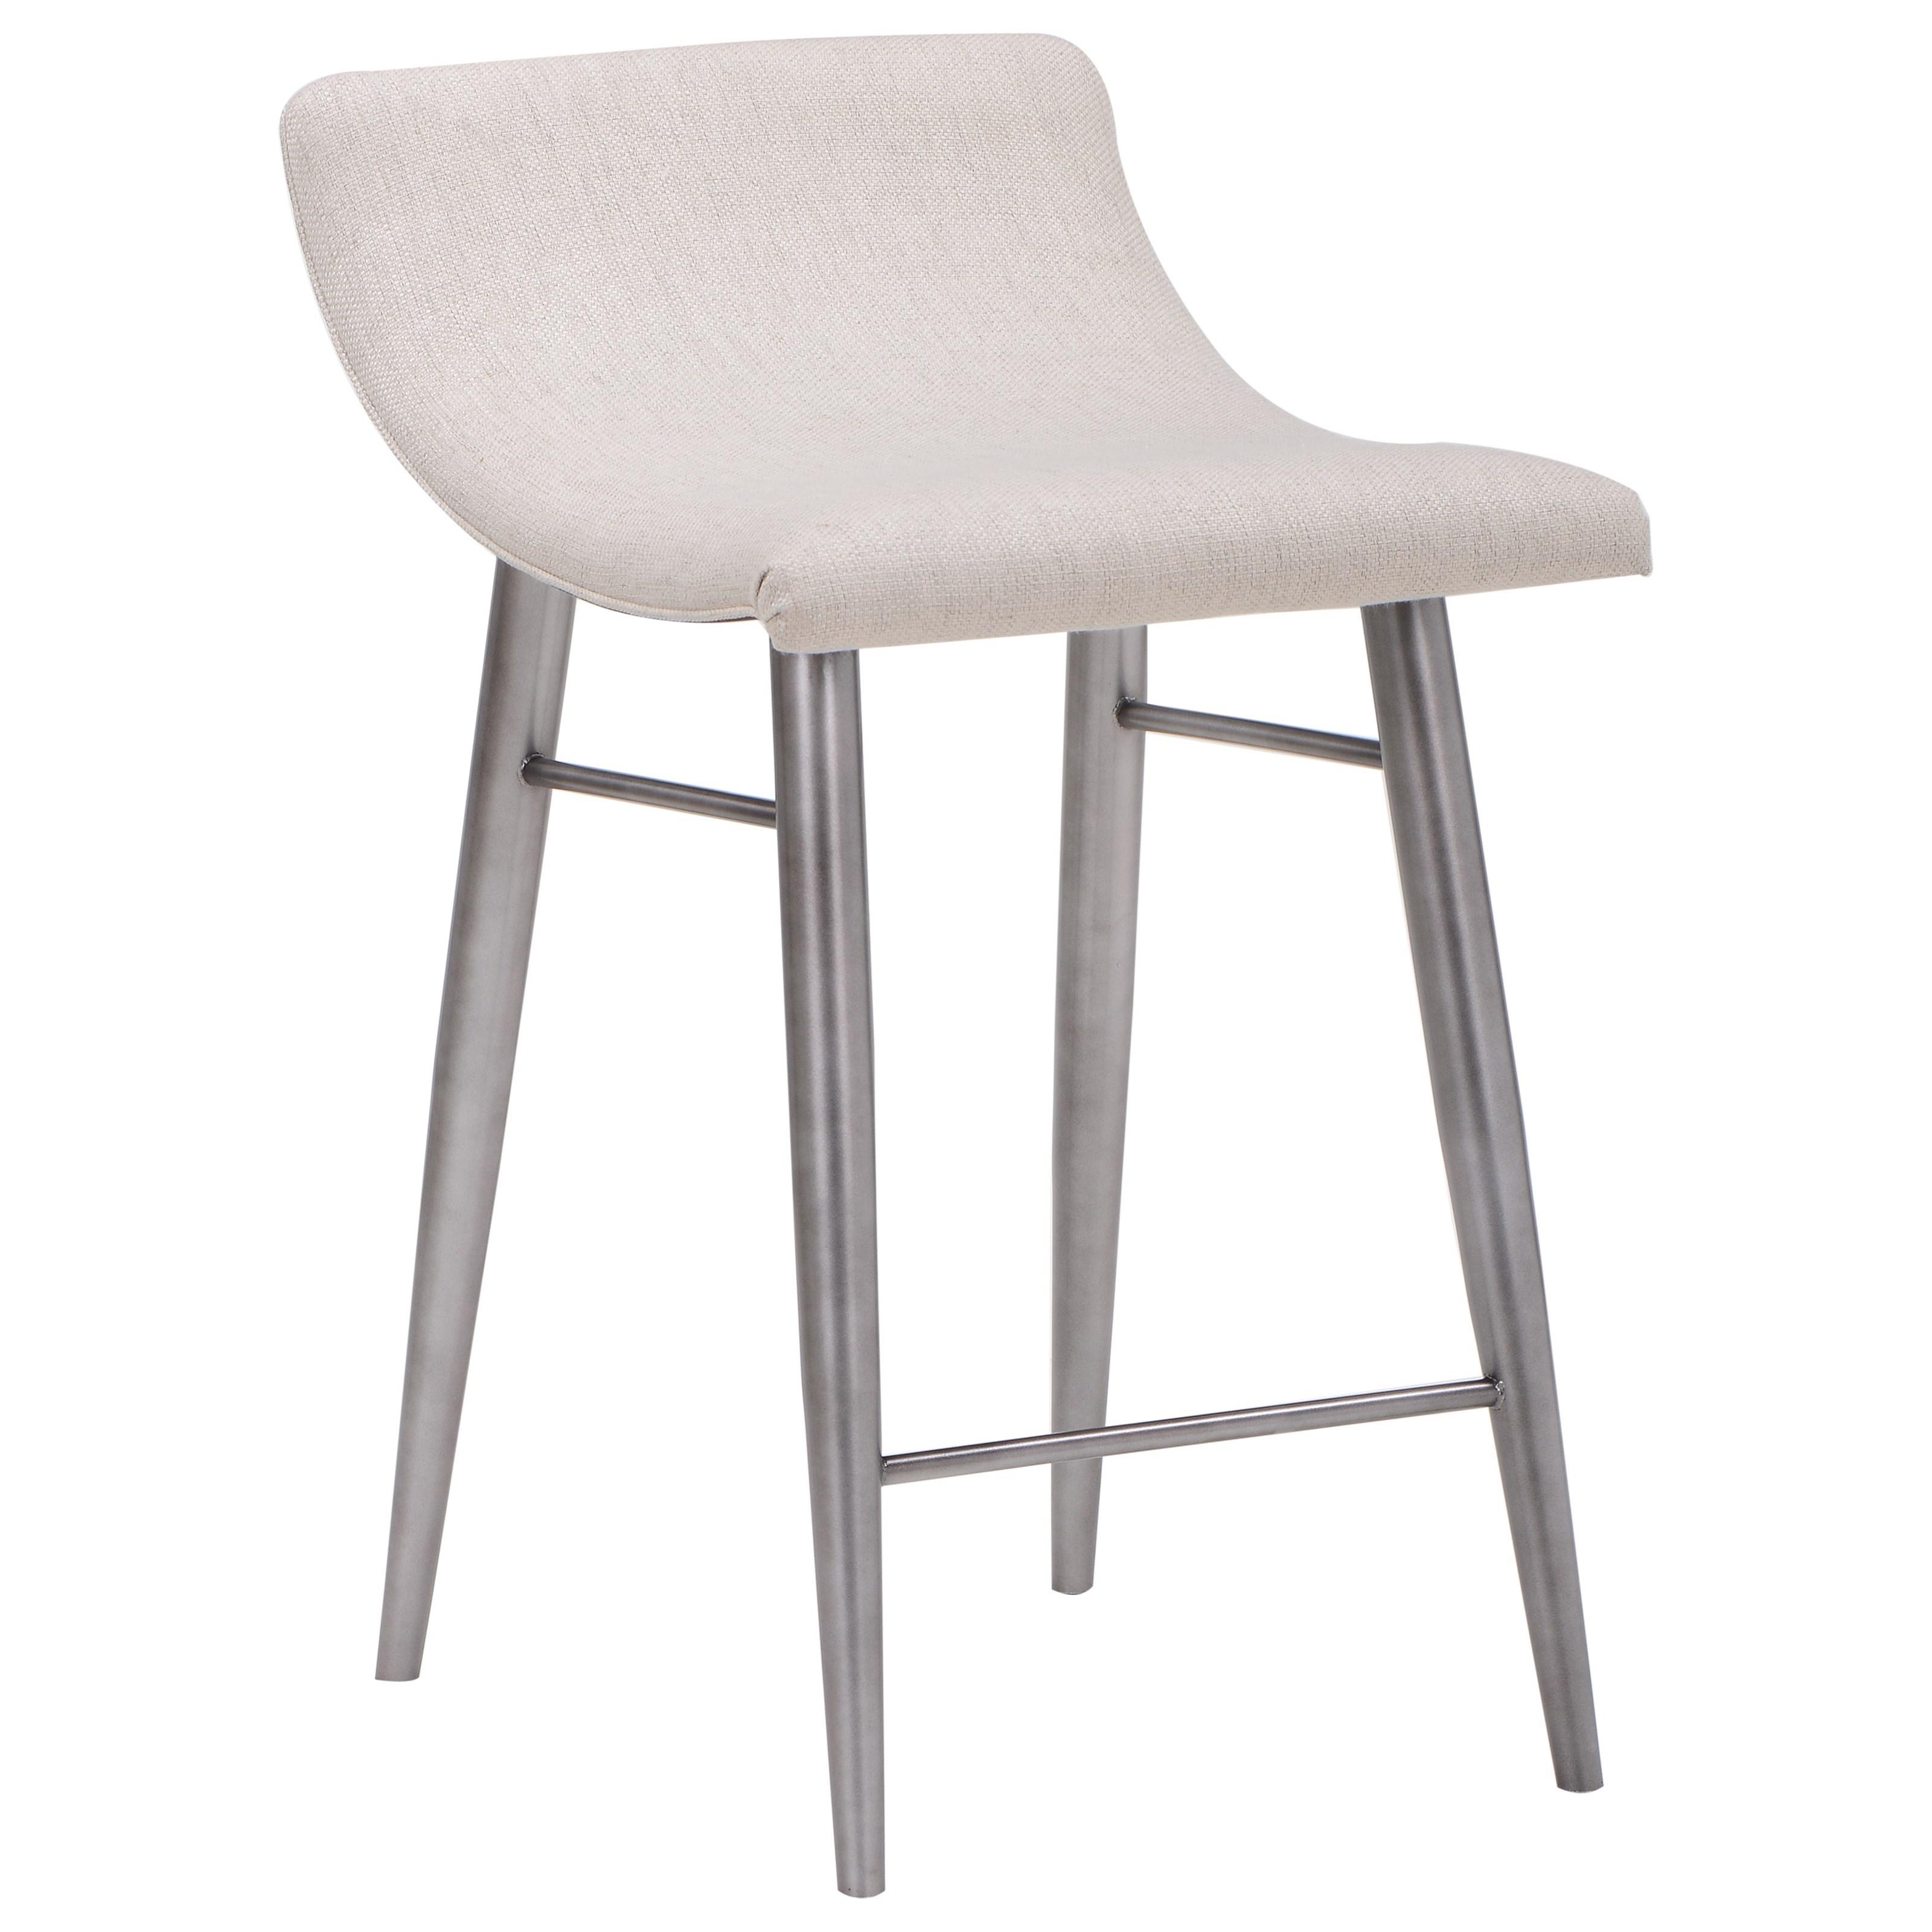 A R T Furniture Inc Prossimo 250209 1244cl Contemporary